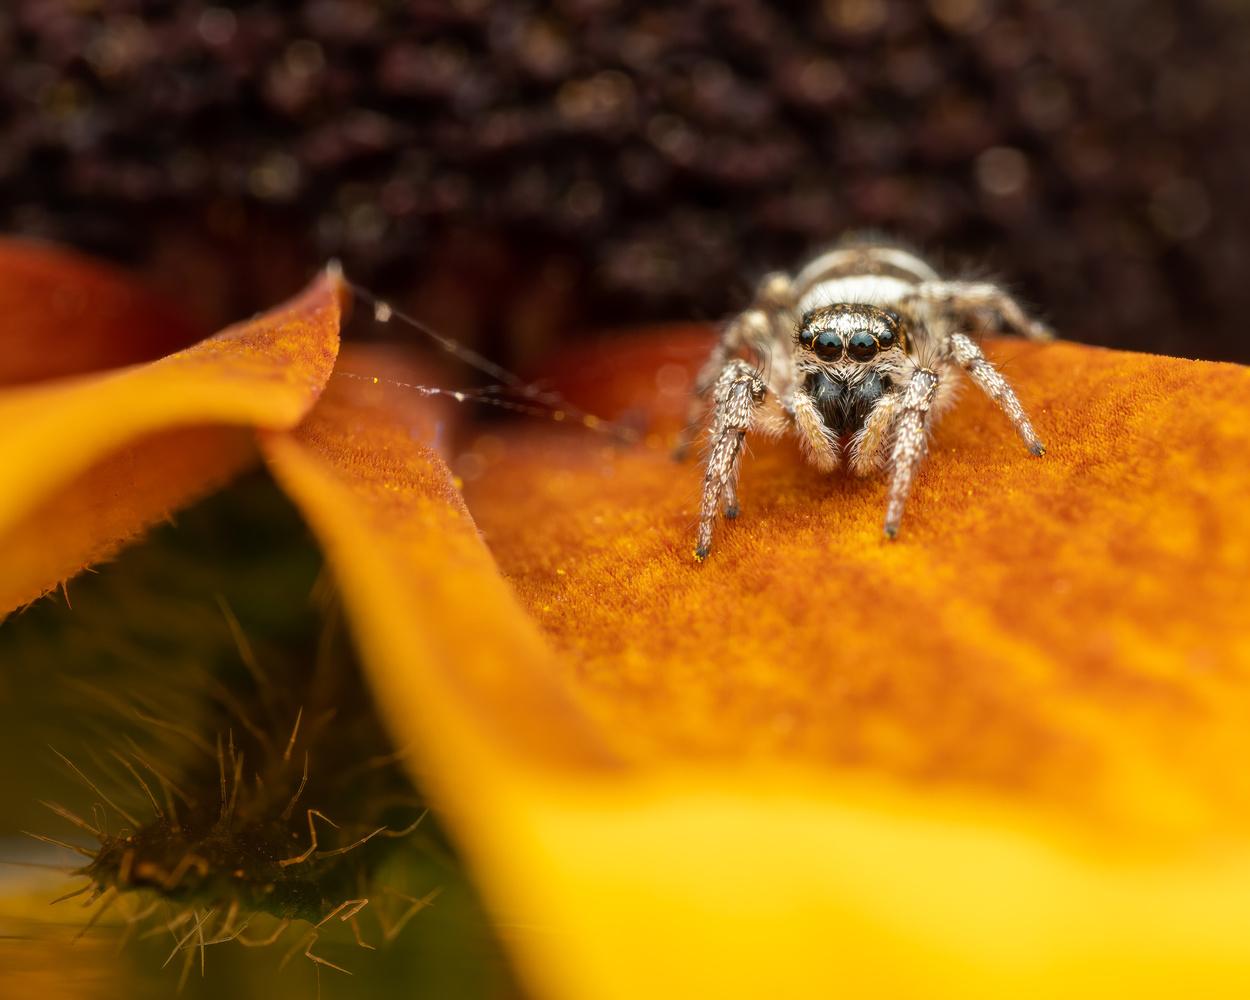 Jumping spider by Skyler Ewing